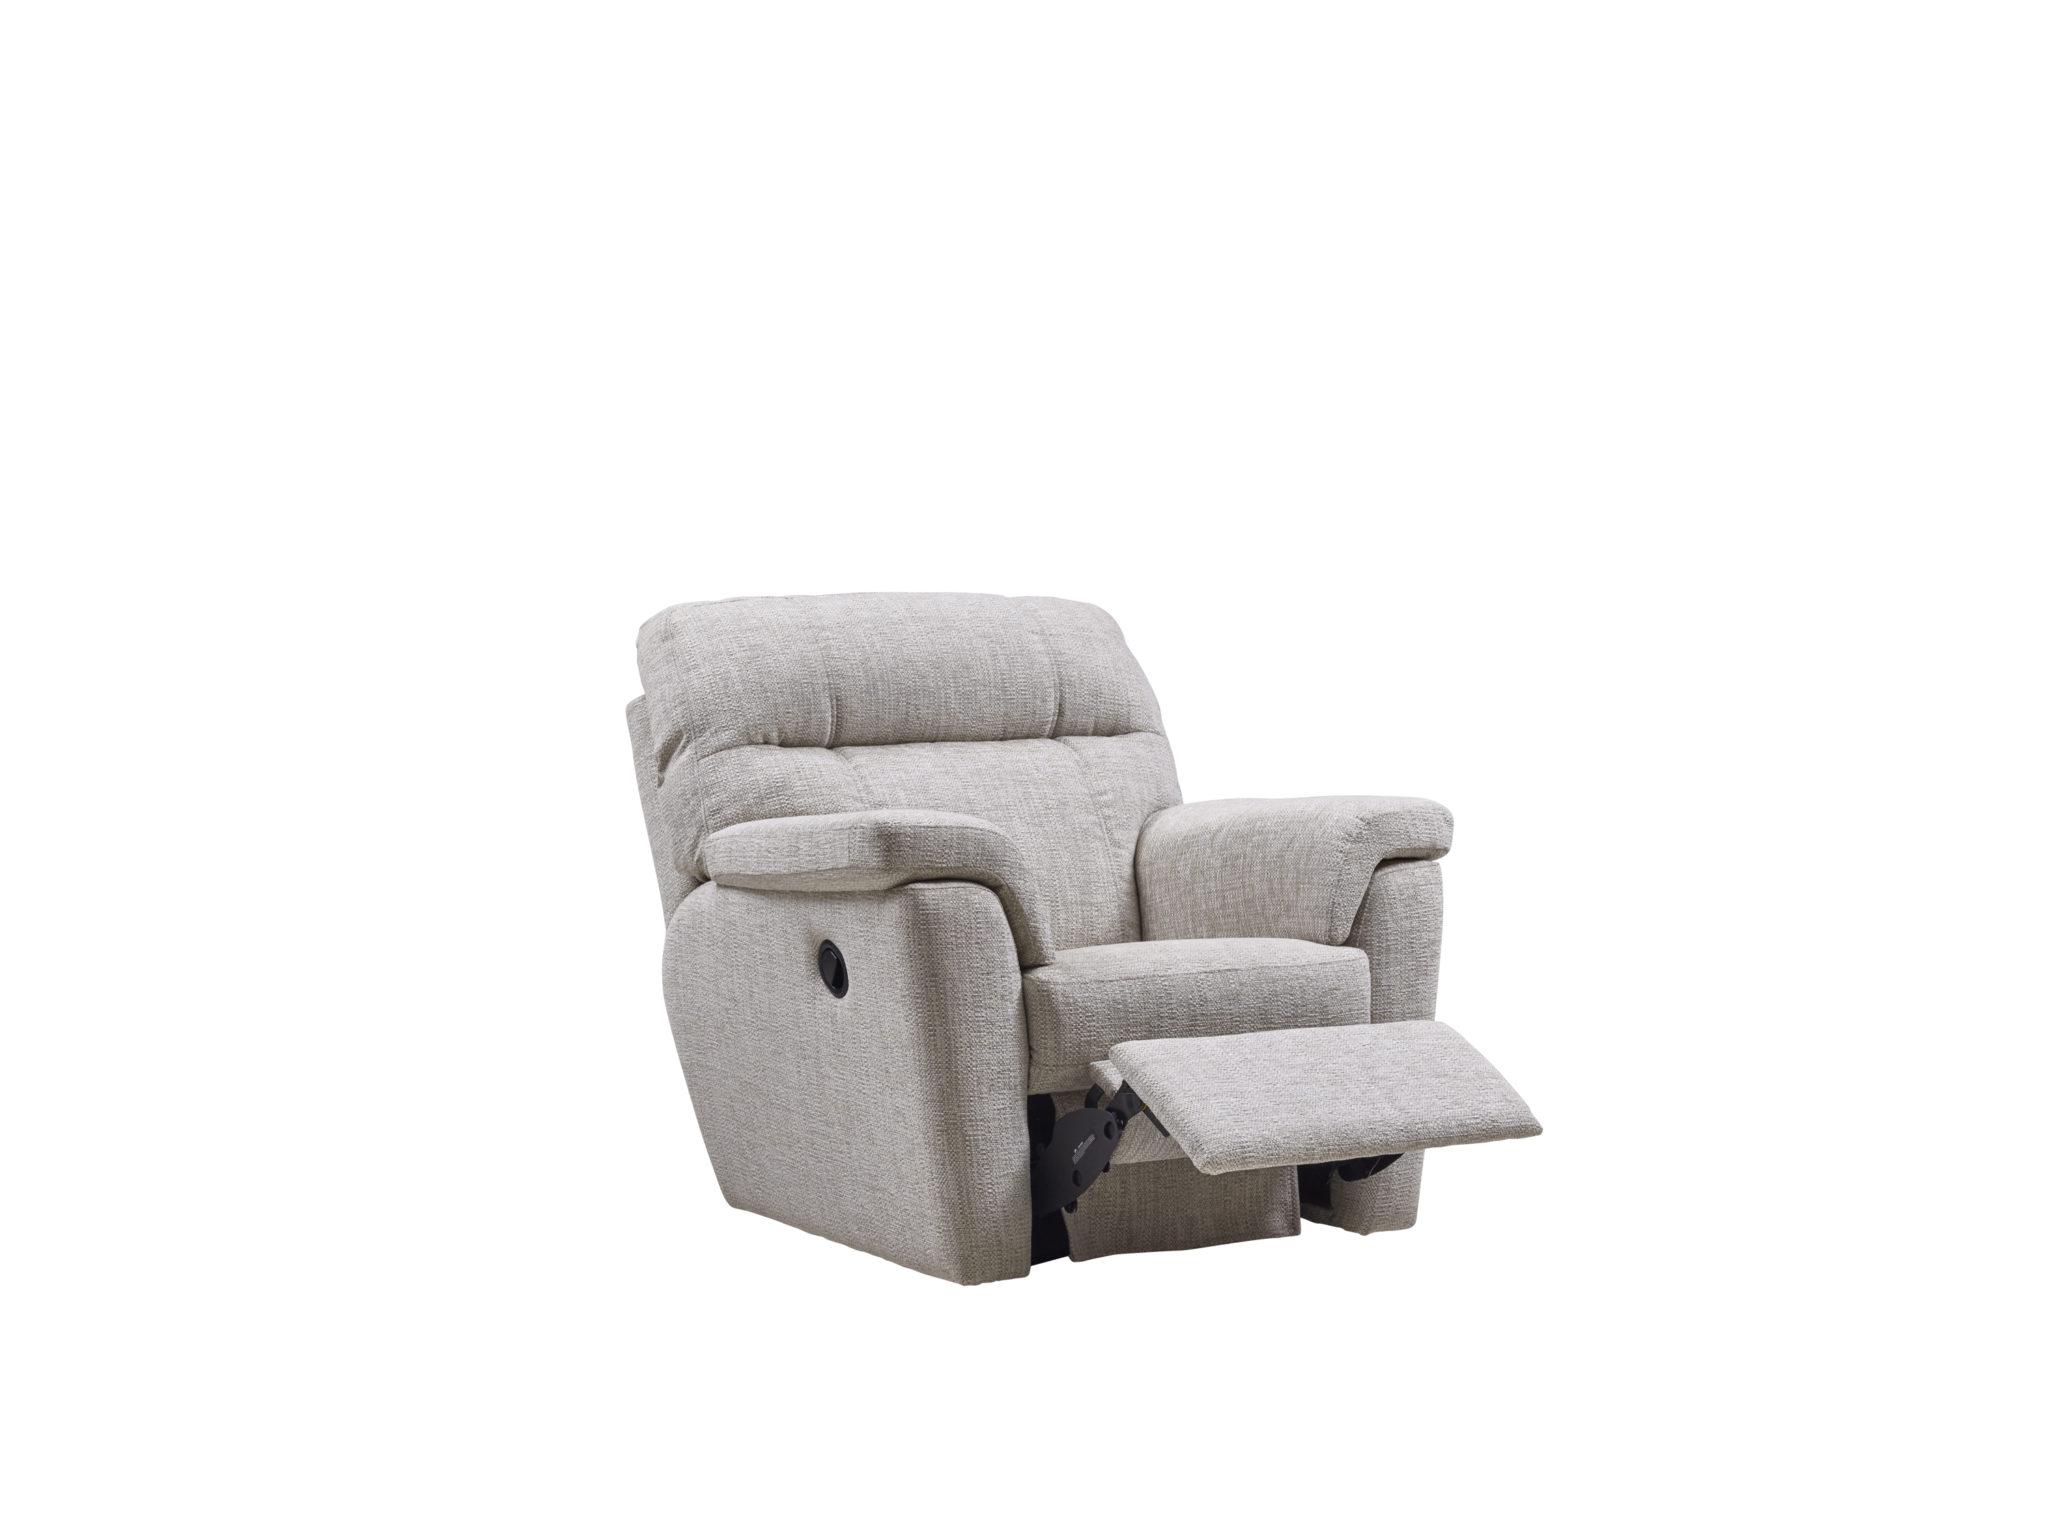 Marvelous Avon Manual Recliner Chair Alphanode Cool Chair Designs And Ideas Alphanodeonline